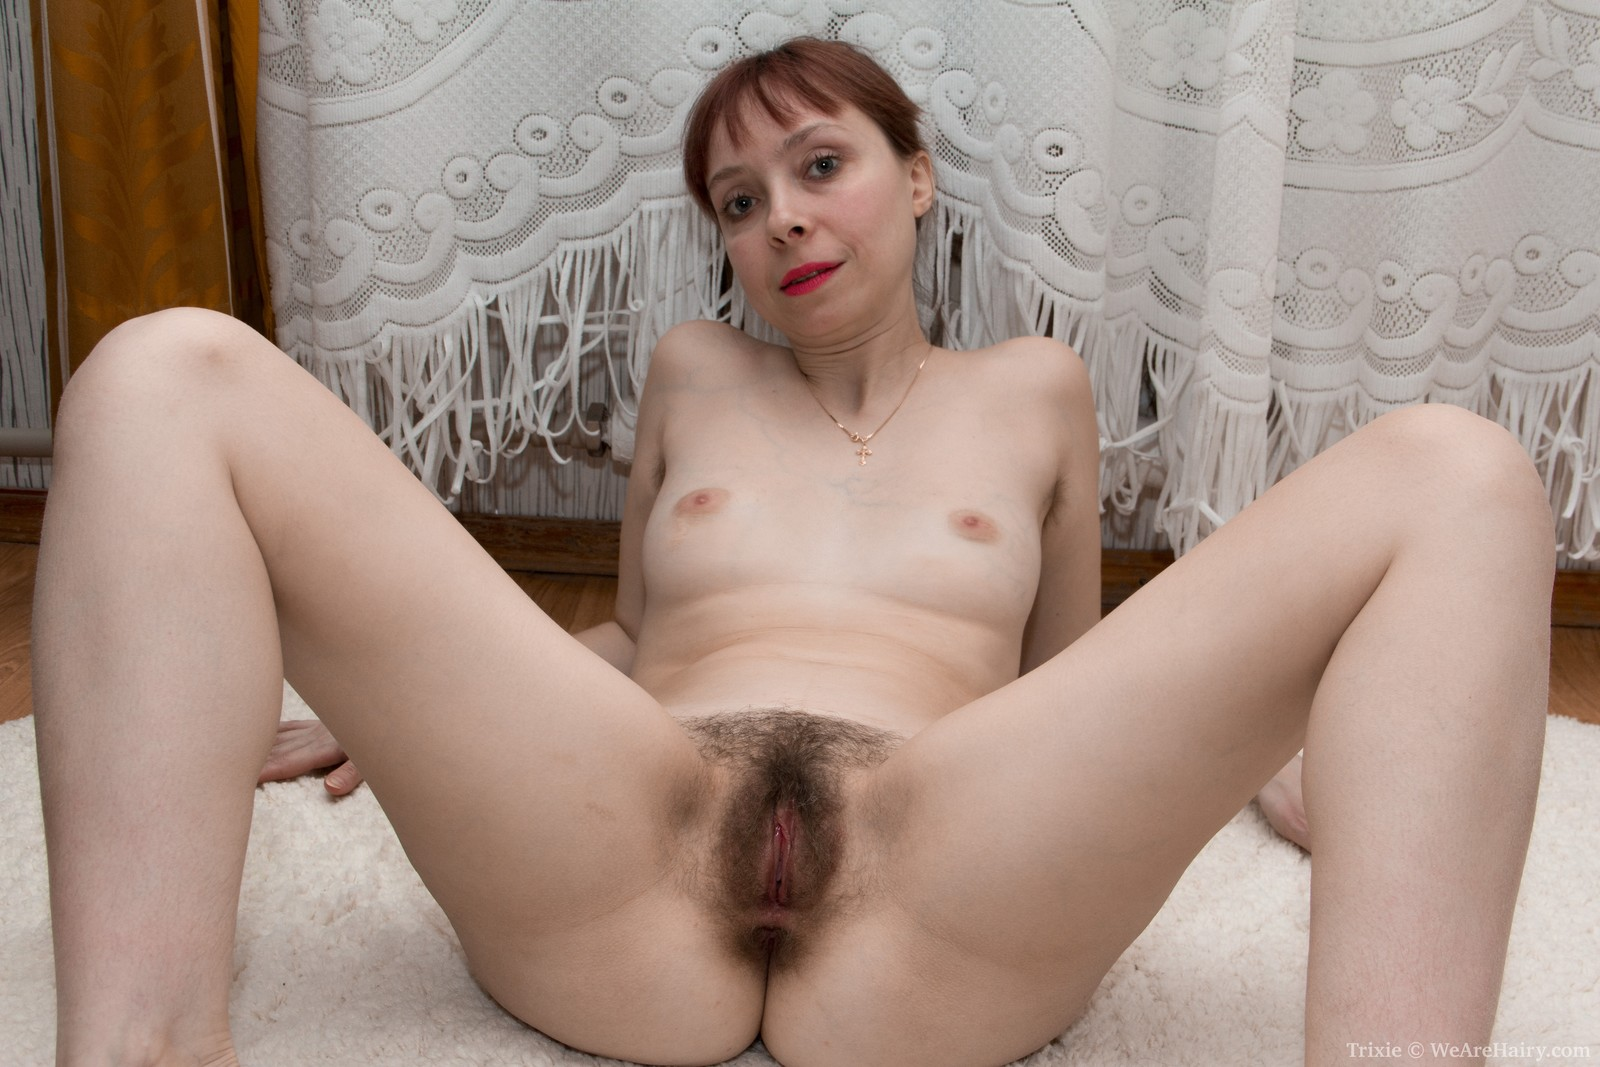 Teen phone camera nude girl